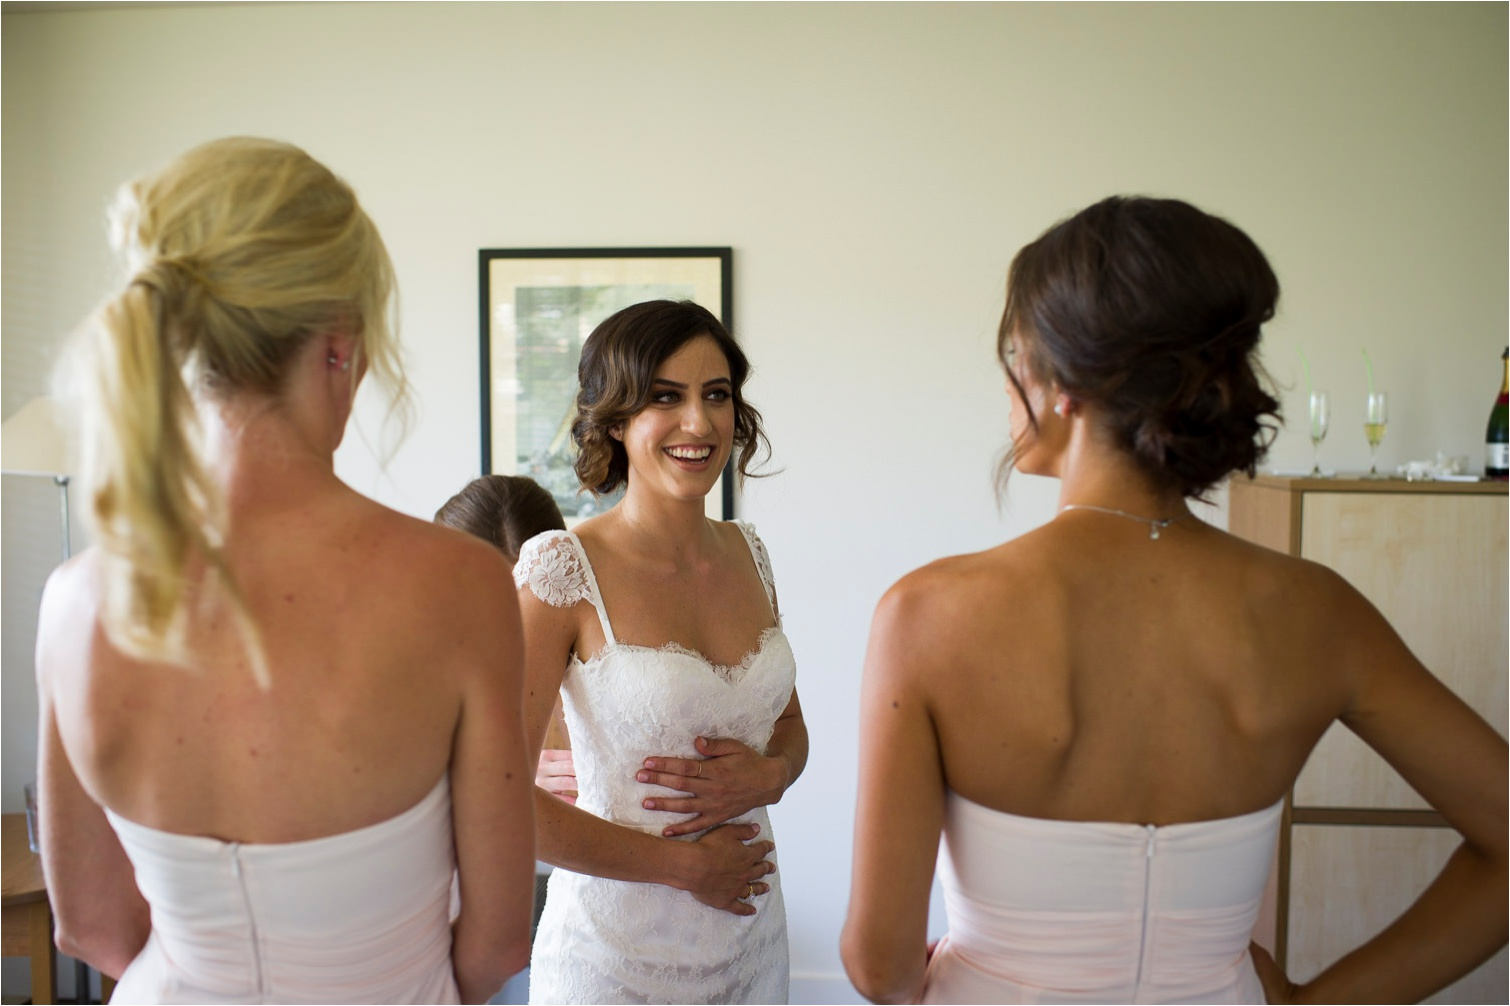 Nicole&Carlie_Watsons_Bay_Hotel_Wedding_by_Gold_Coast_Photographers-The_Follans5.jpg